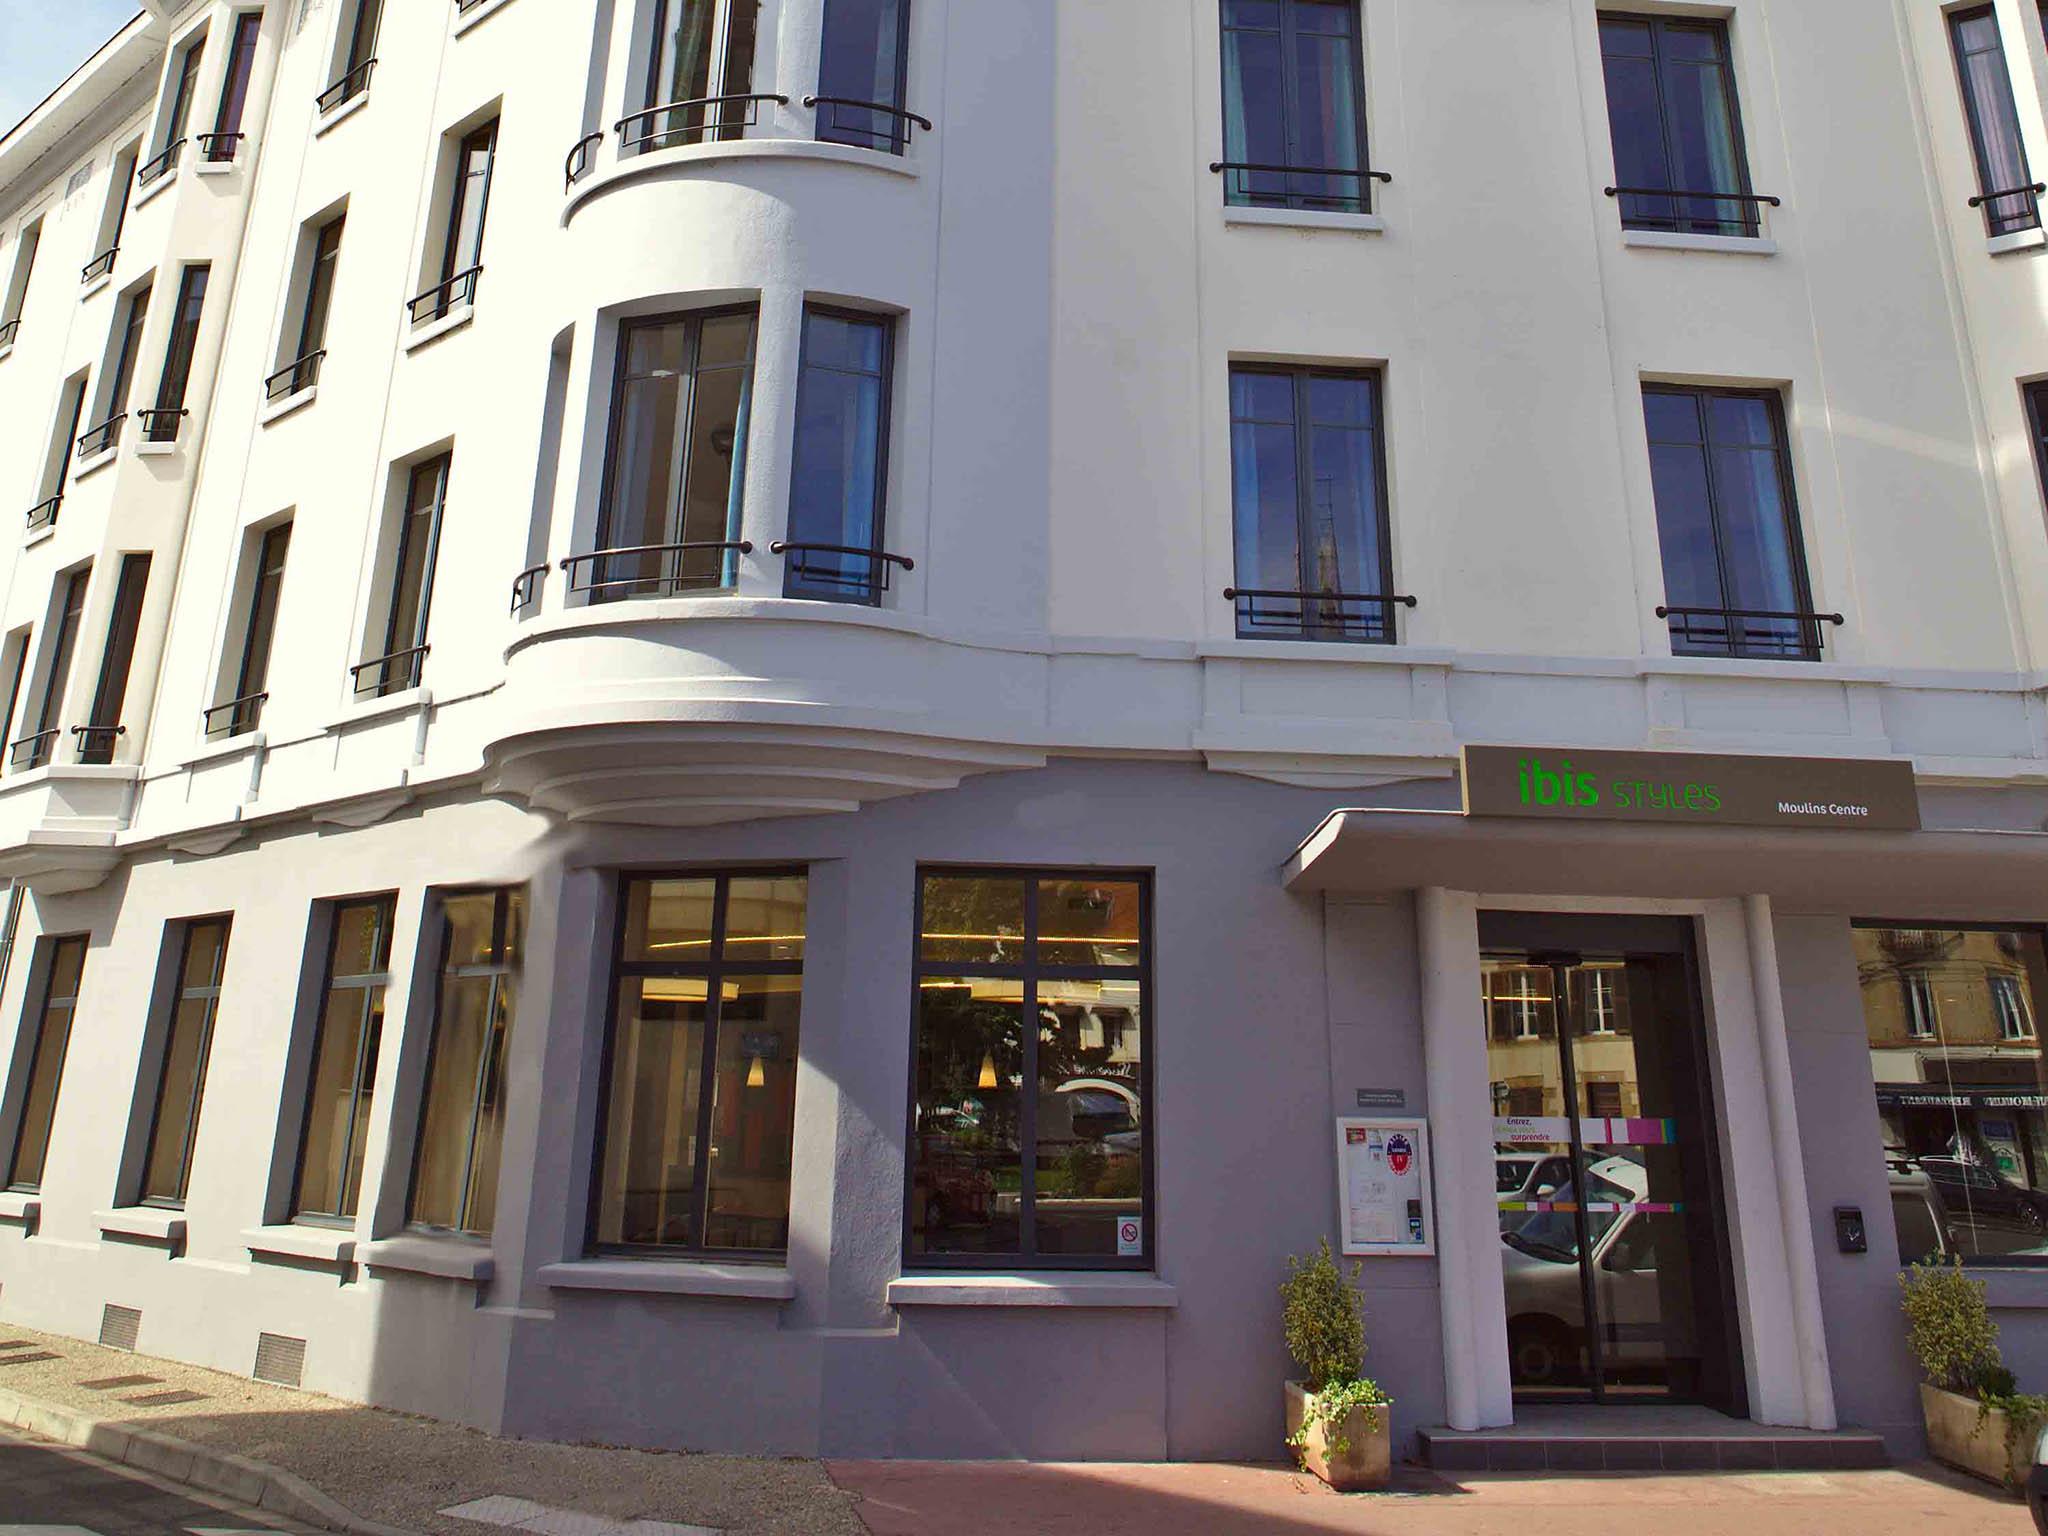 酒店 – ibis Styles Moulins Centre